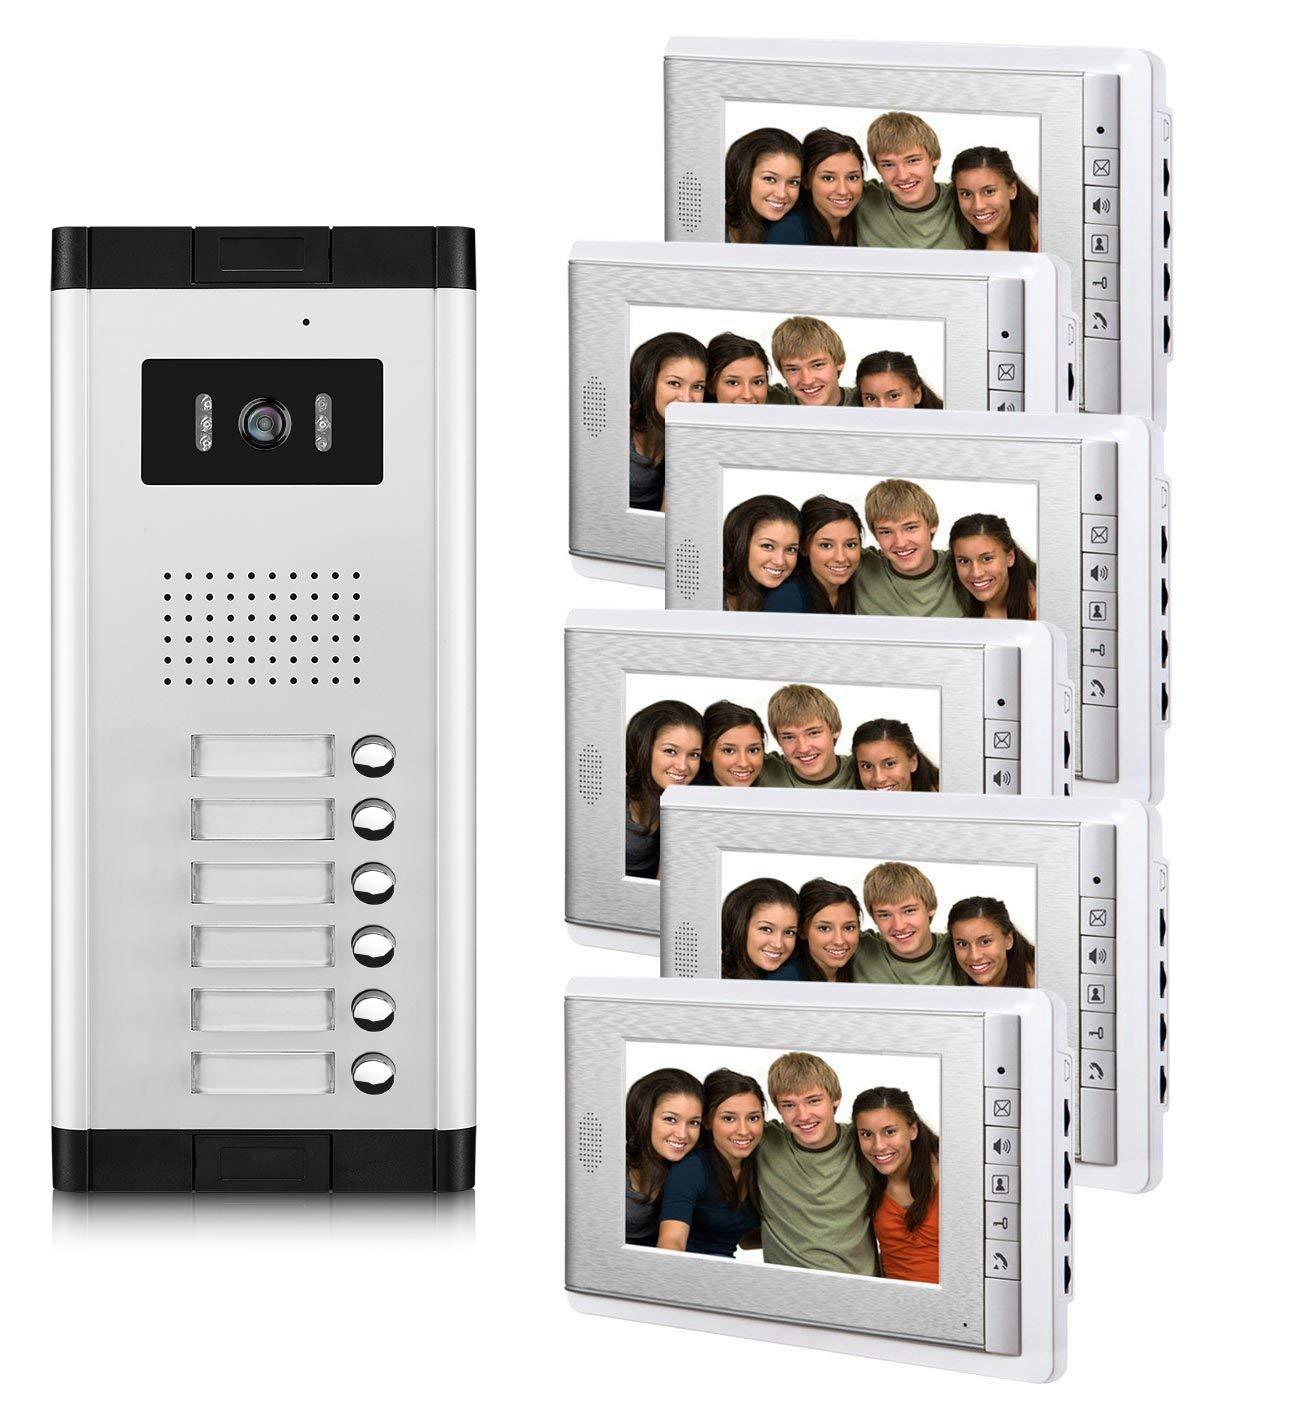 "AMOCAM 6 Household Apartment Video Intercom System, 7"" Monitor Wired Video Door Phone Kit, Can See Hear Video Doorbell Kits, Monitoring, Unlock, Dual Way Door Intercom, 1 PCS Camera 6 PCS Screen"